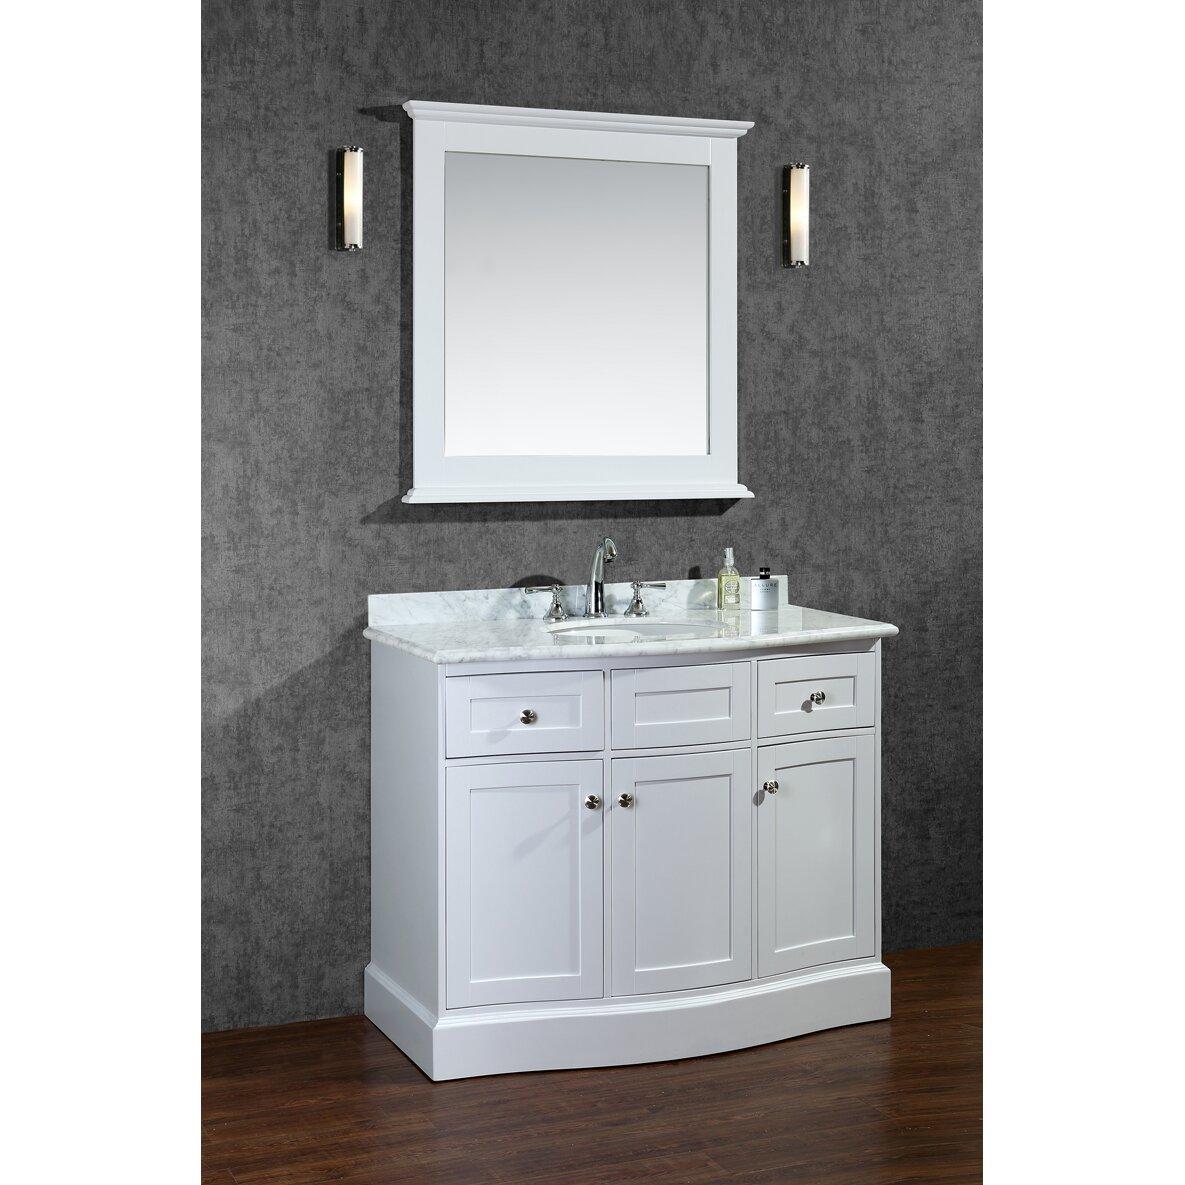 Ariel bath montauk 42 single bathroom vanity set with for Bathroom mirror set